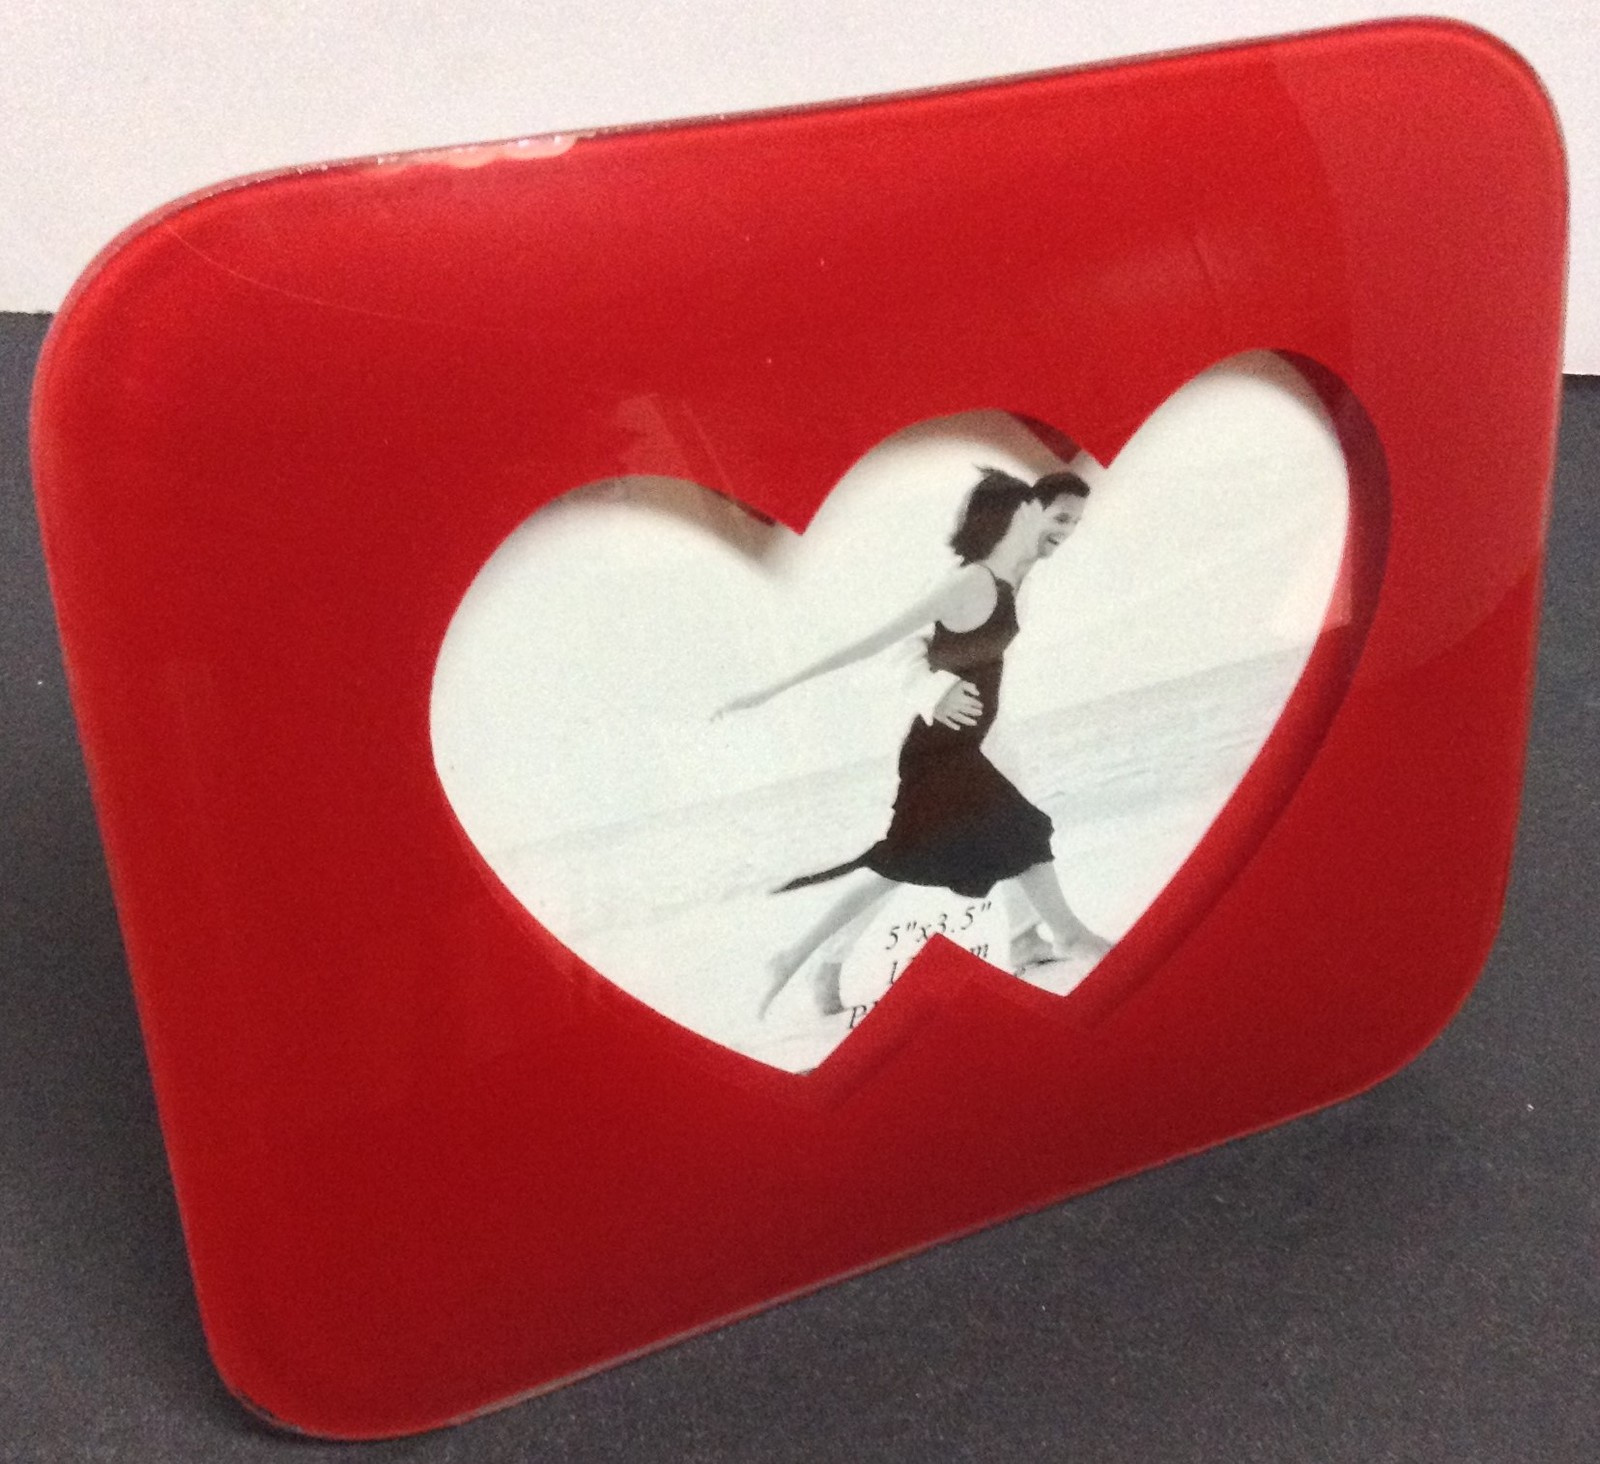 "Glossy Red Double Hearts Photo Frame NWT 7.5"" x 6"" Future Sleek"